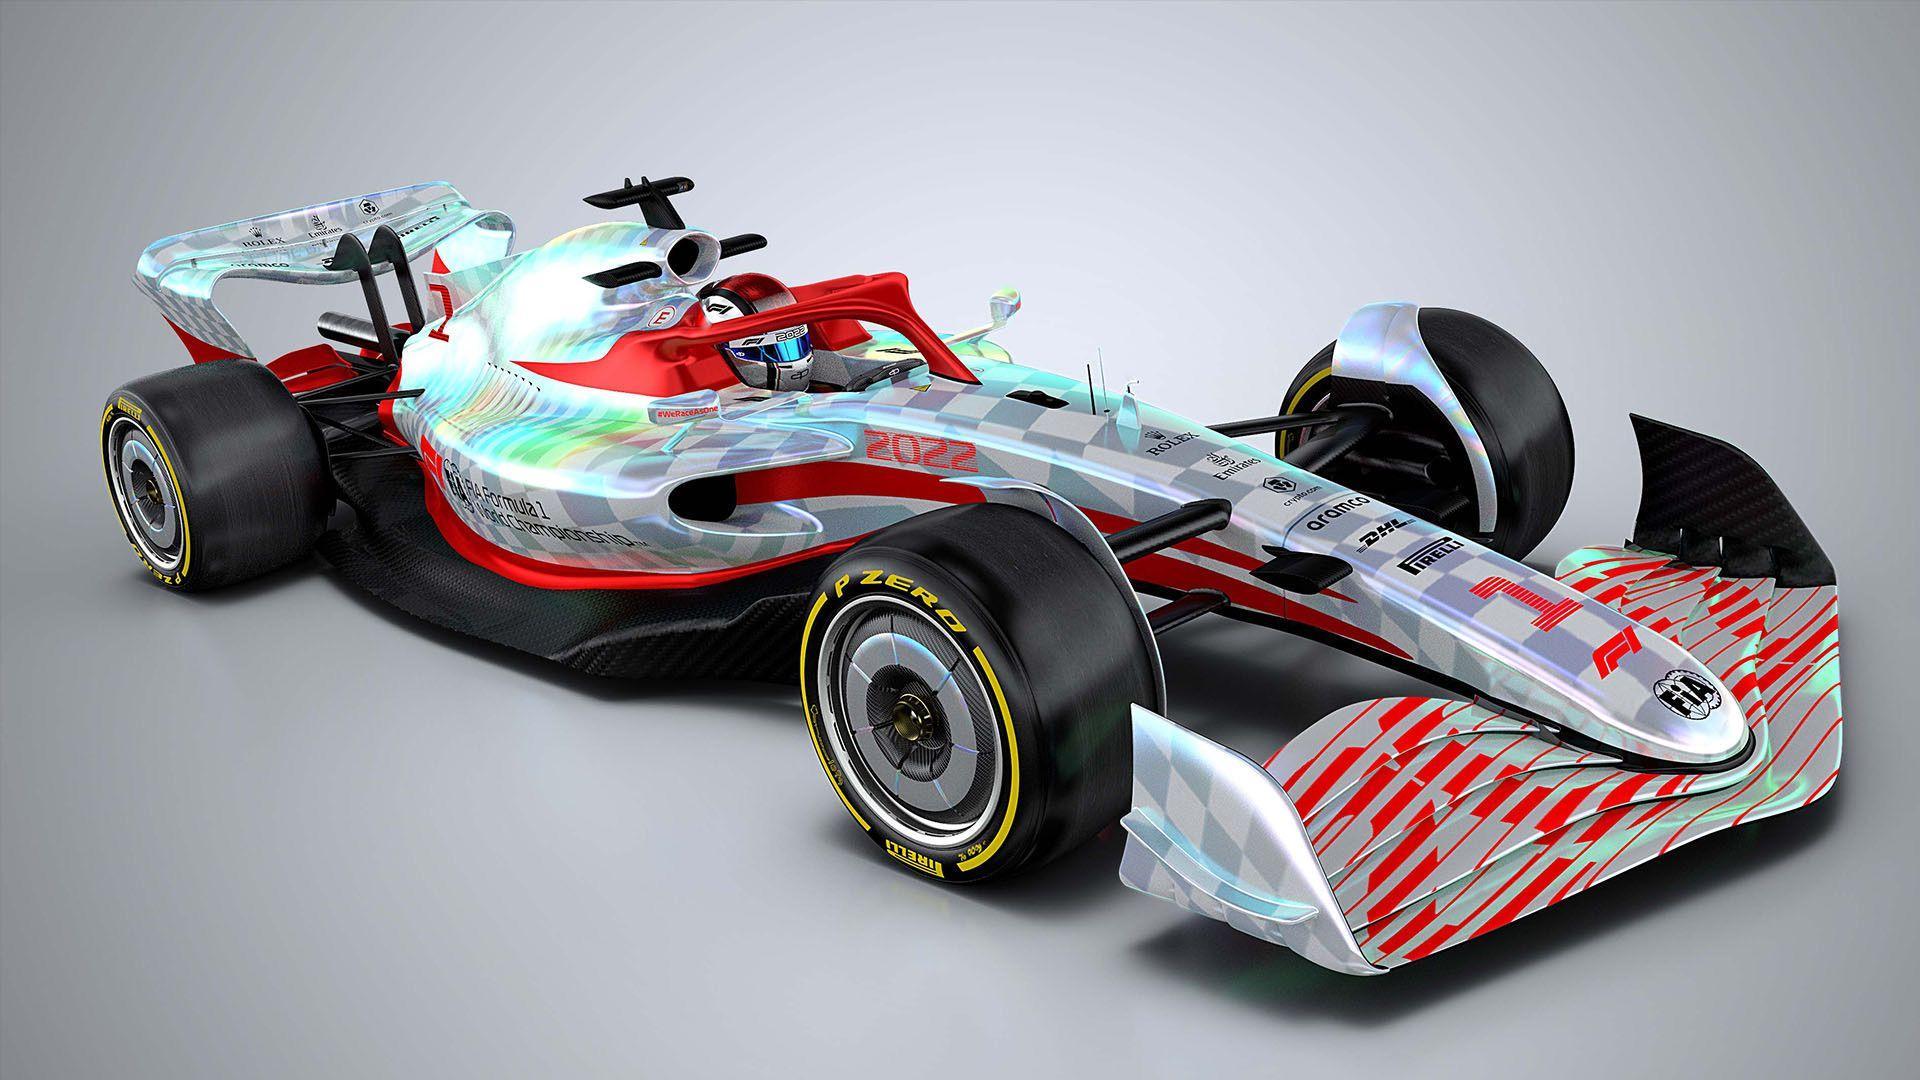 F1-Formula-1-car-2022-10_1920x1080